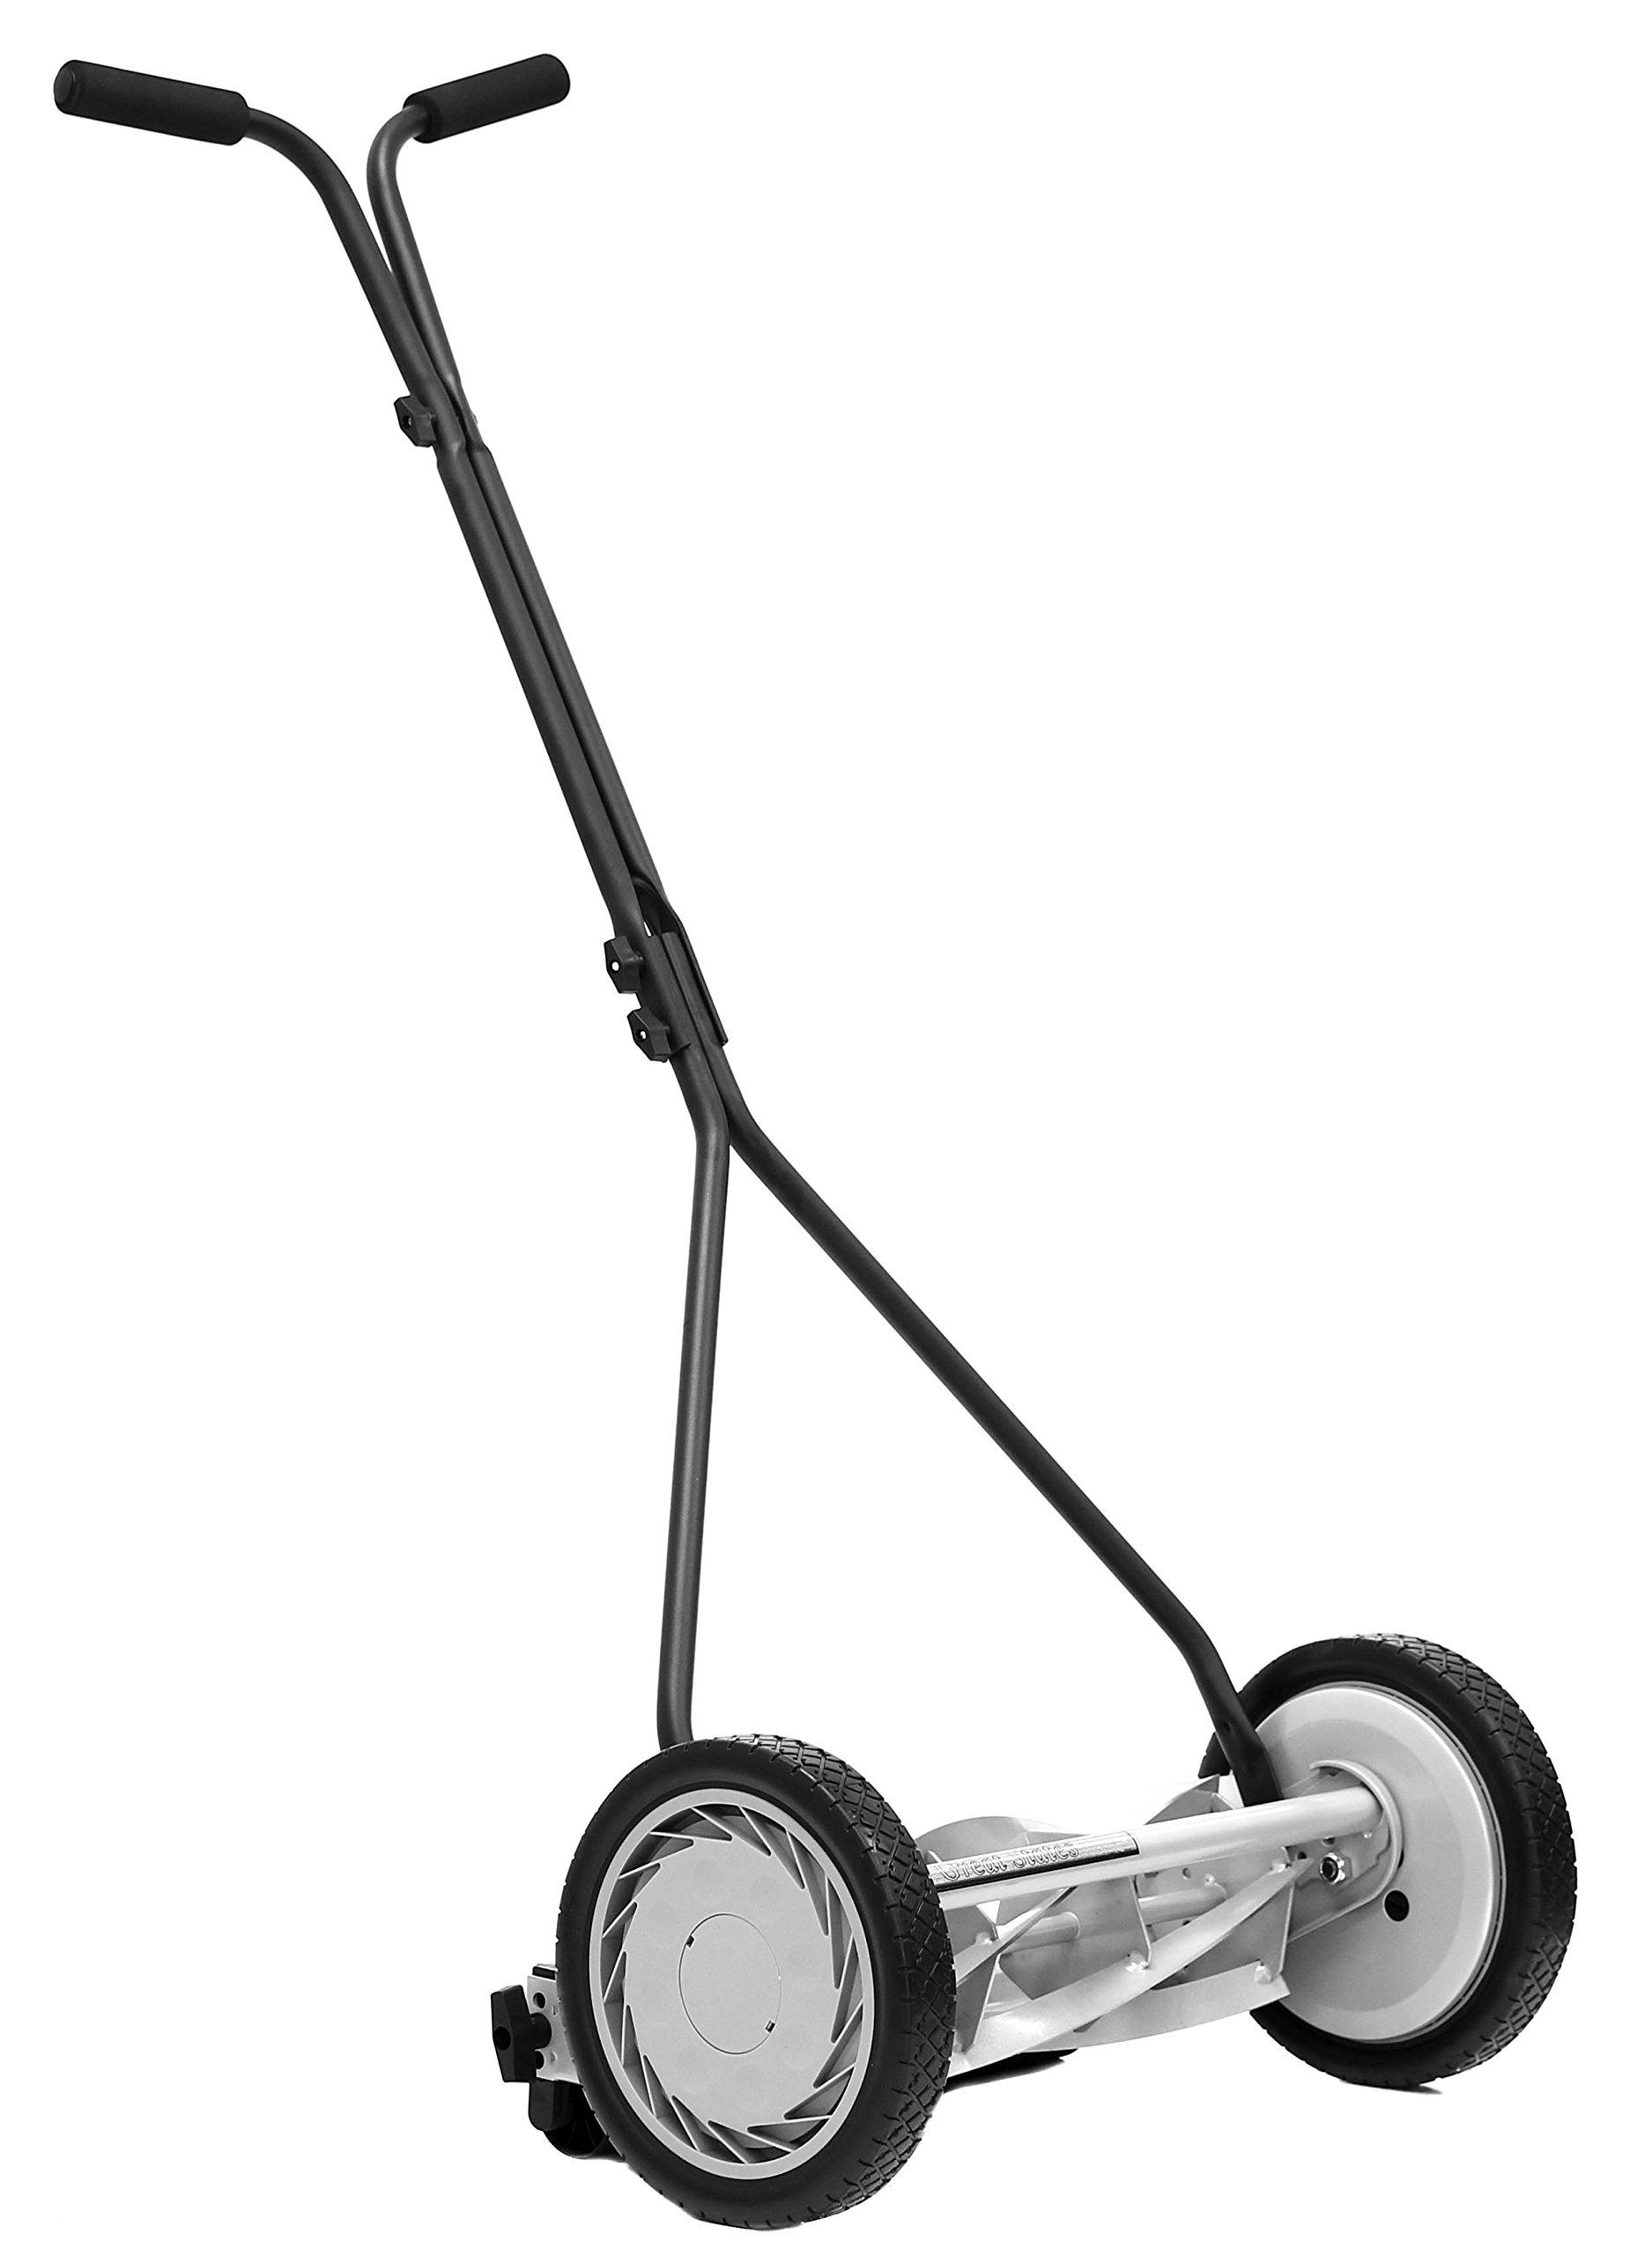 Great States 415-16 16-Inch, 5-Blade Push Reel Lawn Mower, 16-Inch, 5-Blade, Silver by Great States